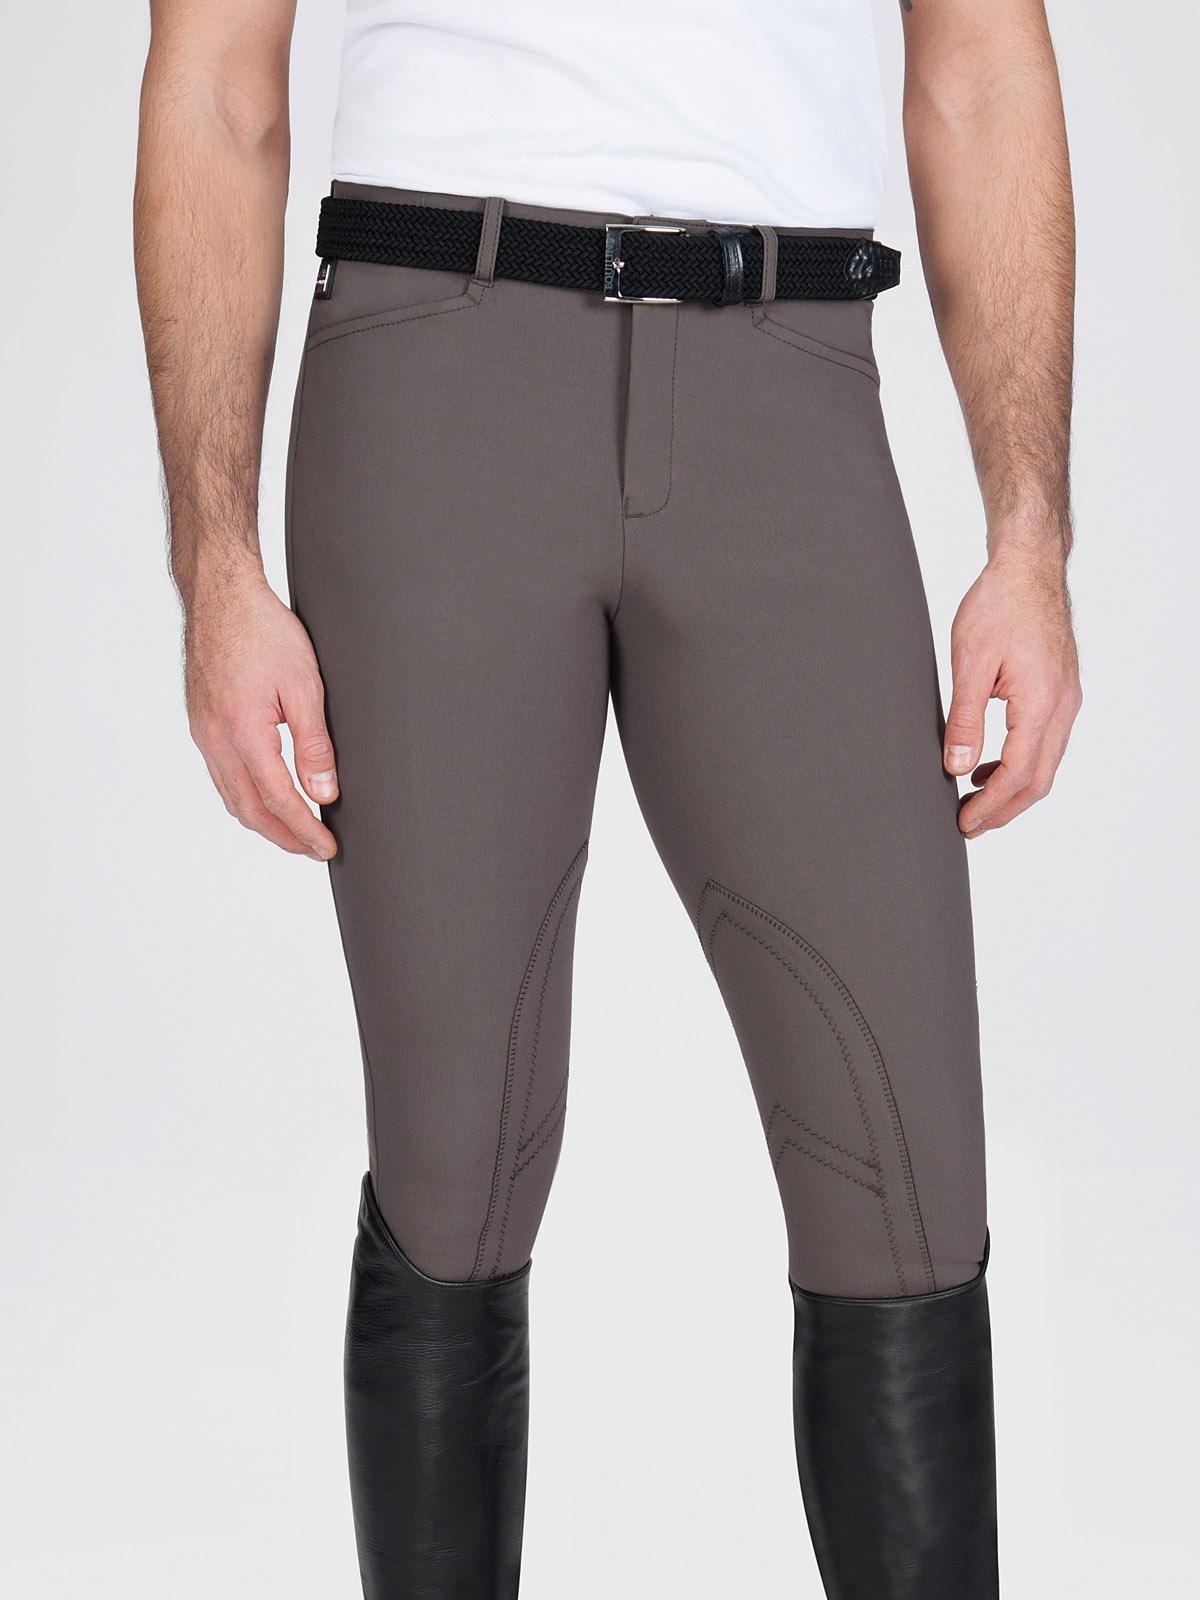 GRAFTON - Men's Knee Patch Riding Breeches 4